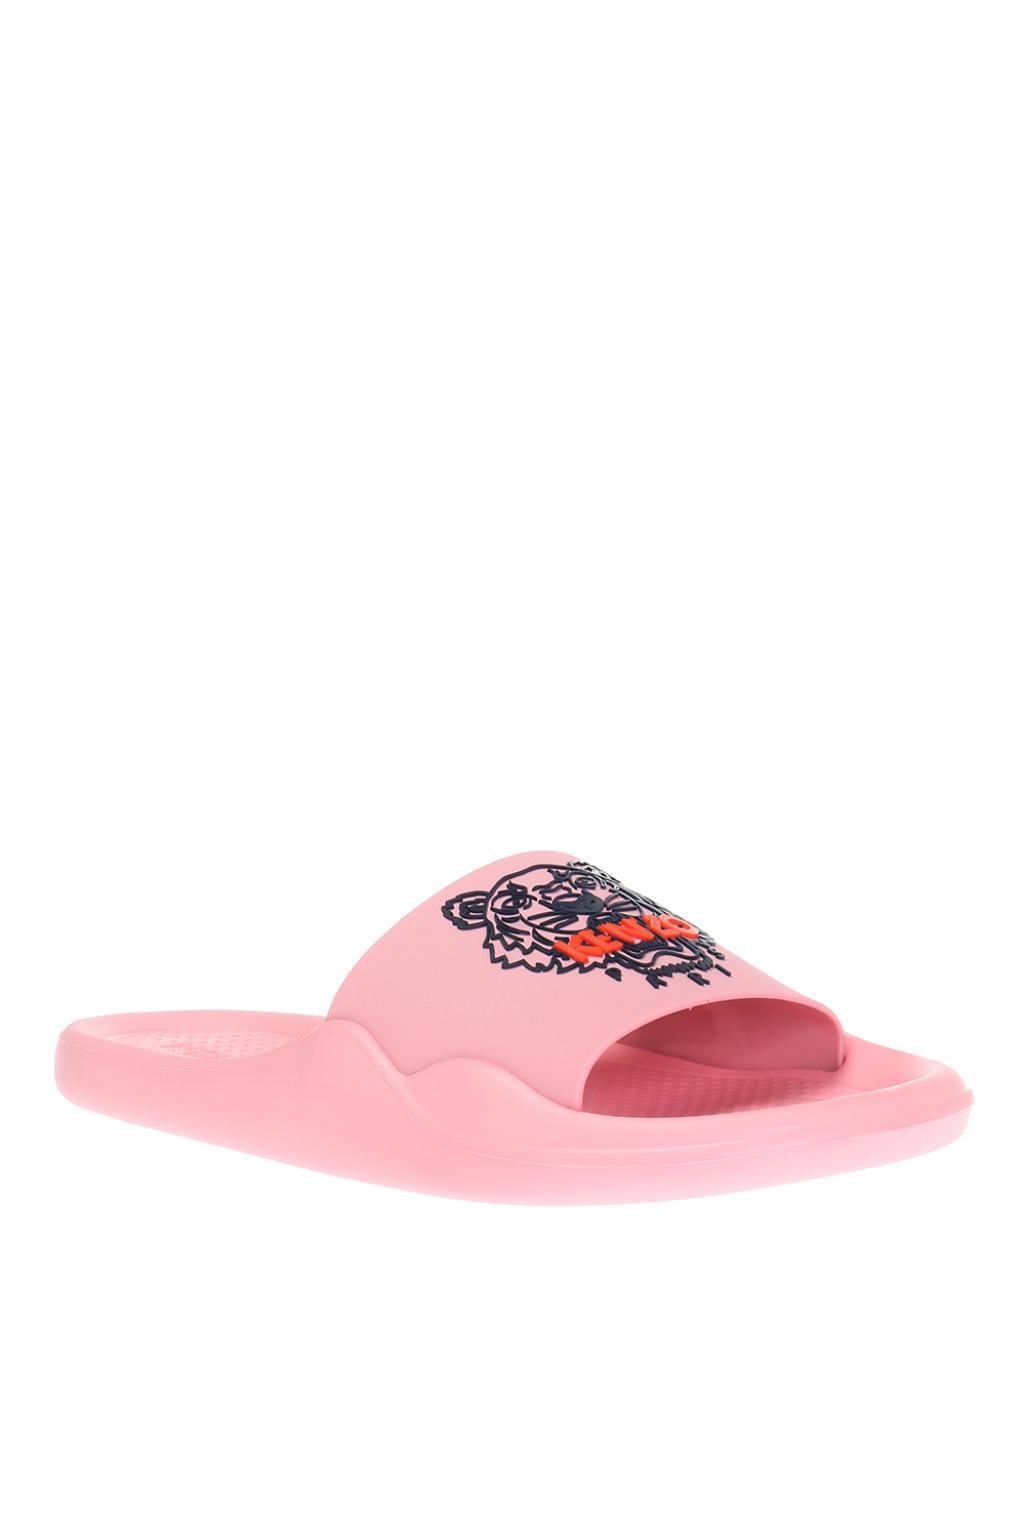 85607d2d0668 KENZO - Pink  tiger  Slides - Lyst. View fullscreen